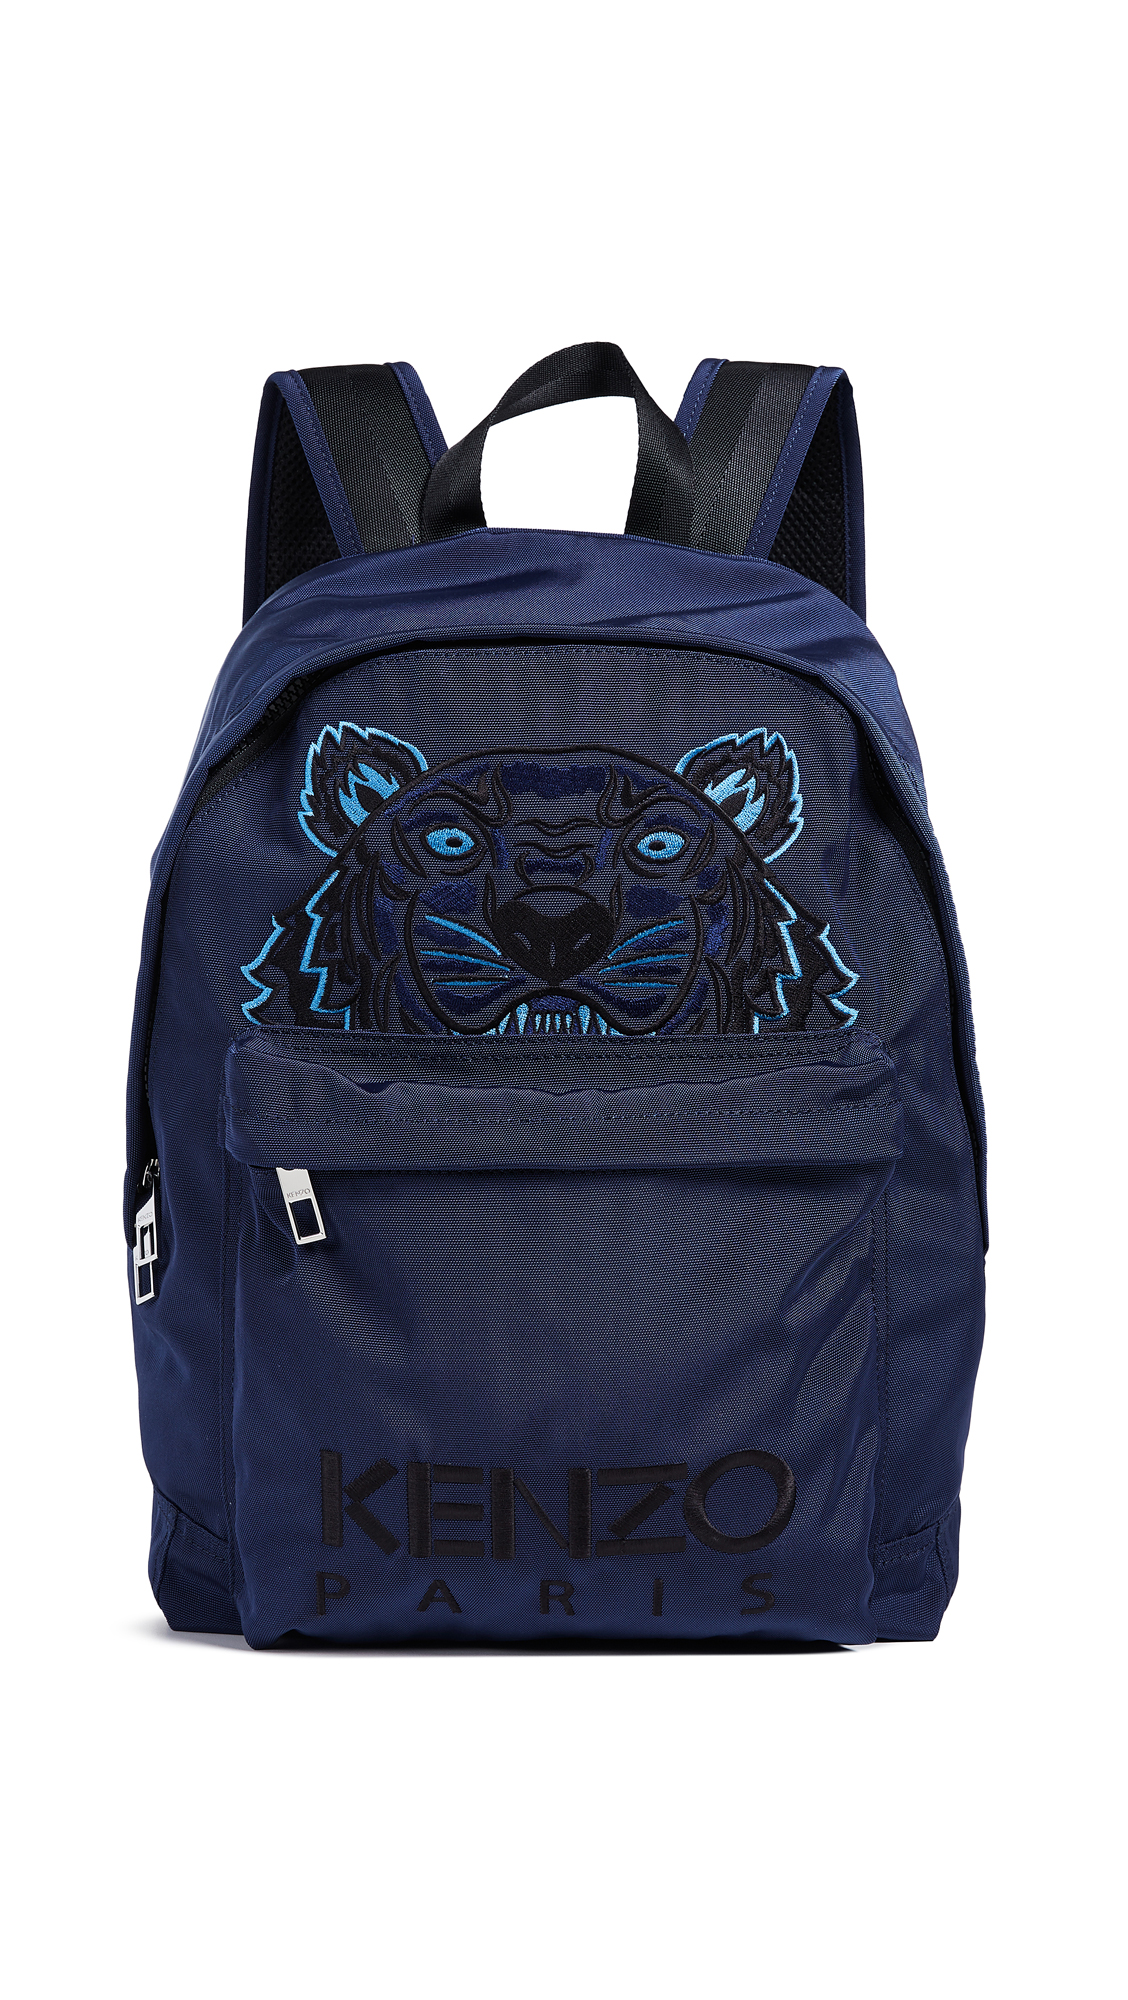 Kenzo Backpack In Navy Blue Modesens Bacpack